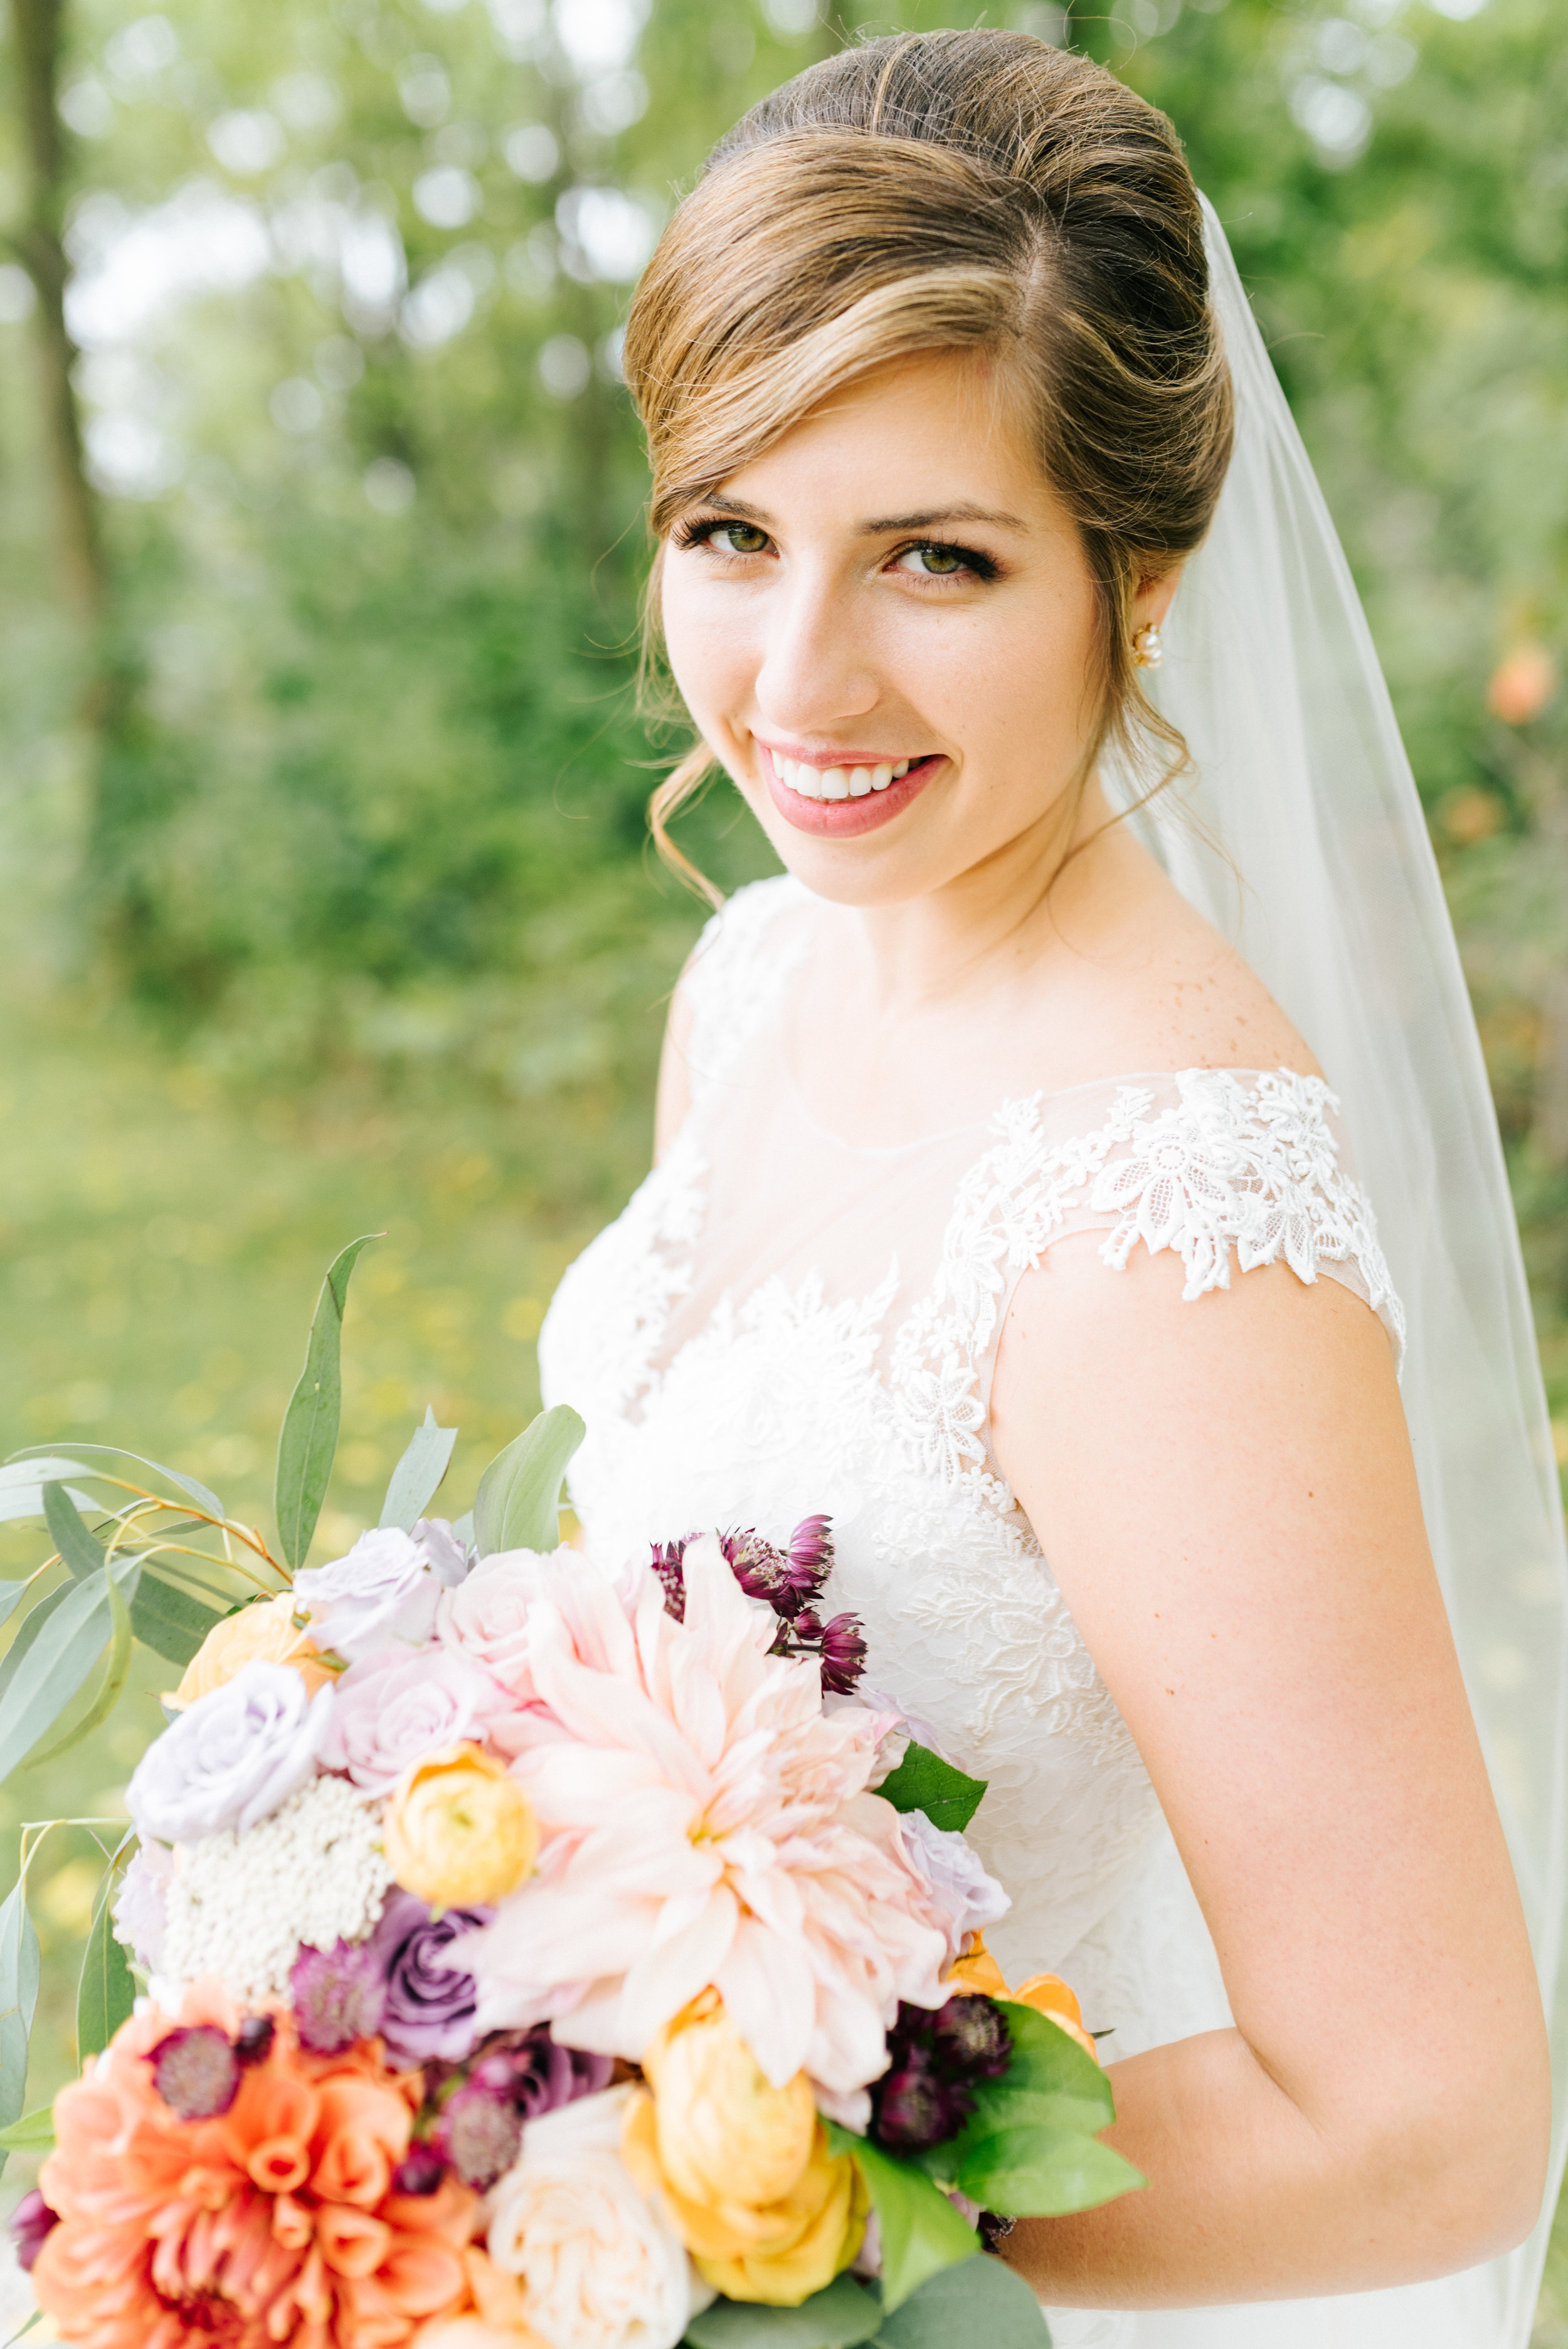 nicoleandjakeannarborwedding-584.jpg